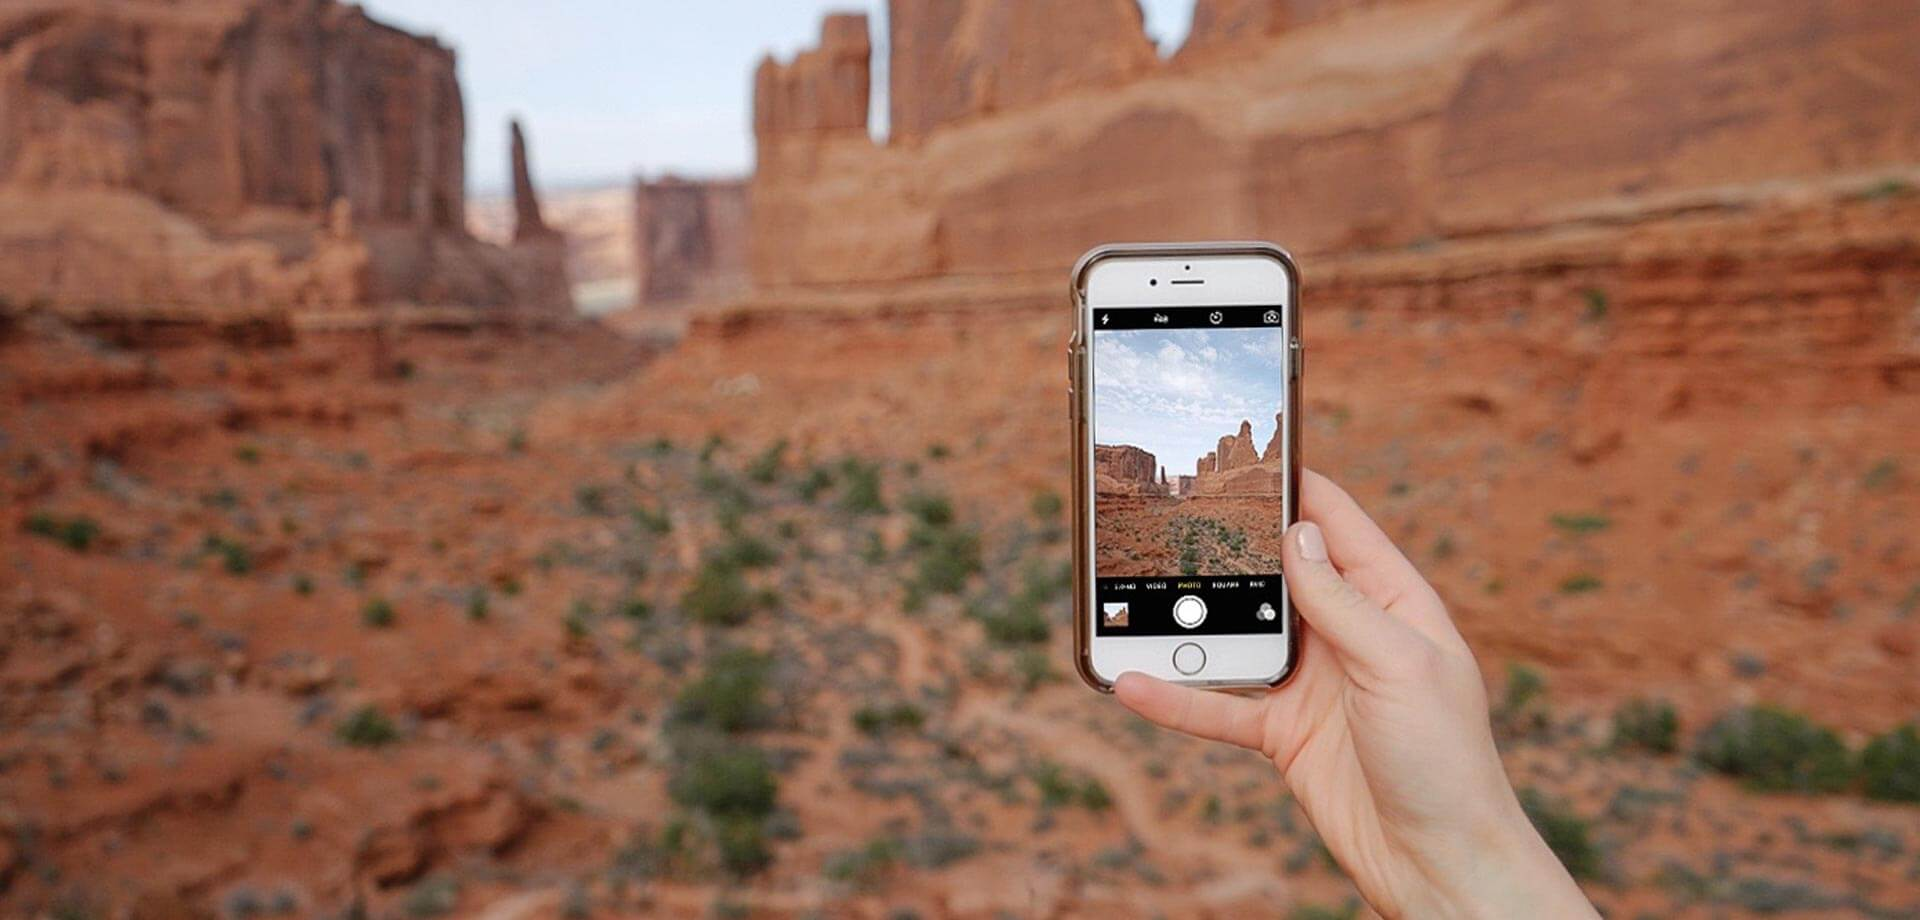 21 Mobile Photography Tips For Incredible Photos Artifact Uprising